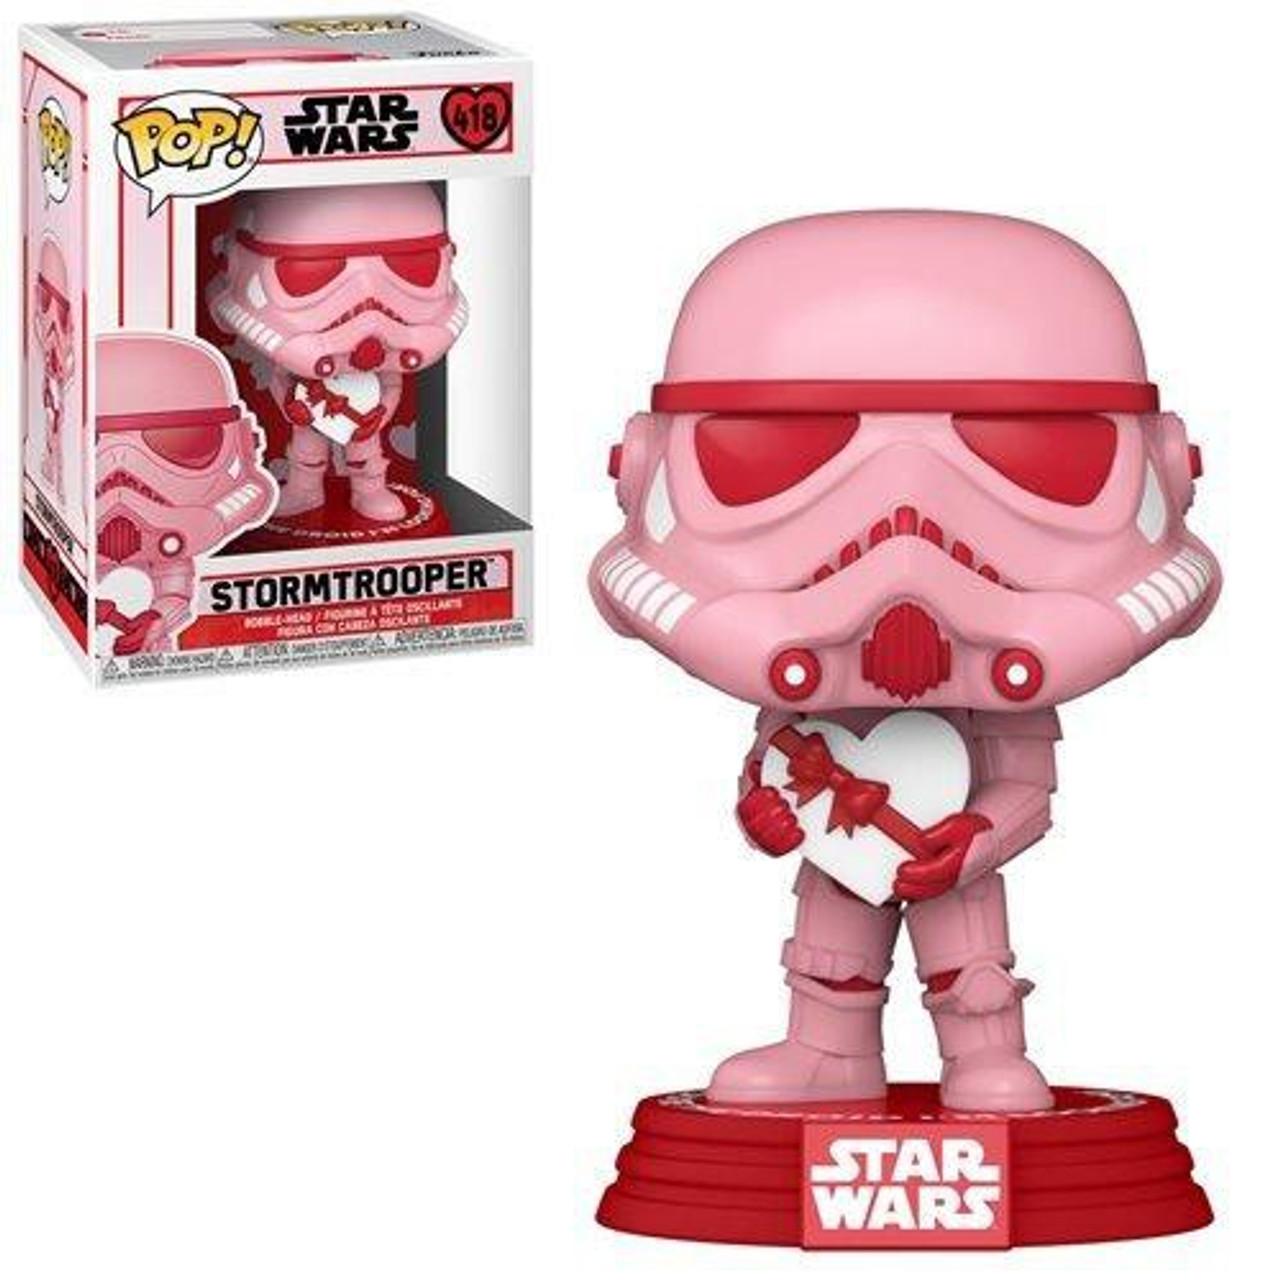 Valentines Stormtrooper With Heart #418 Bobble Star Wars PRE-ORDER Funko POP